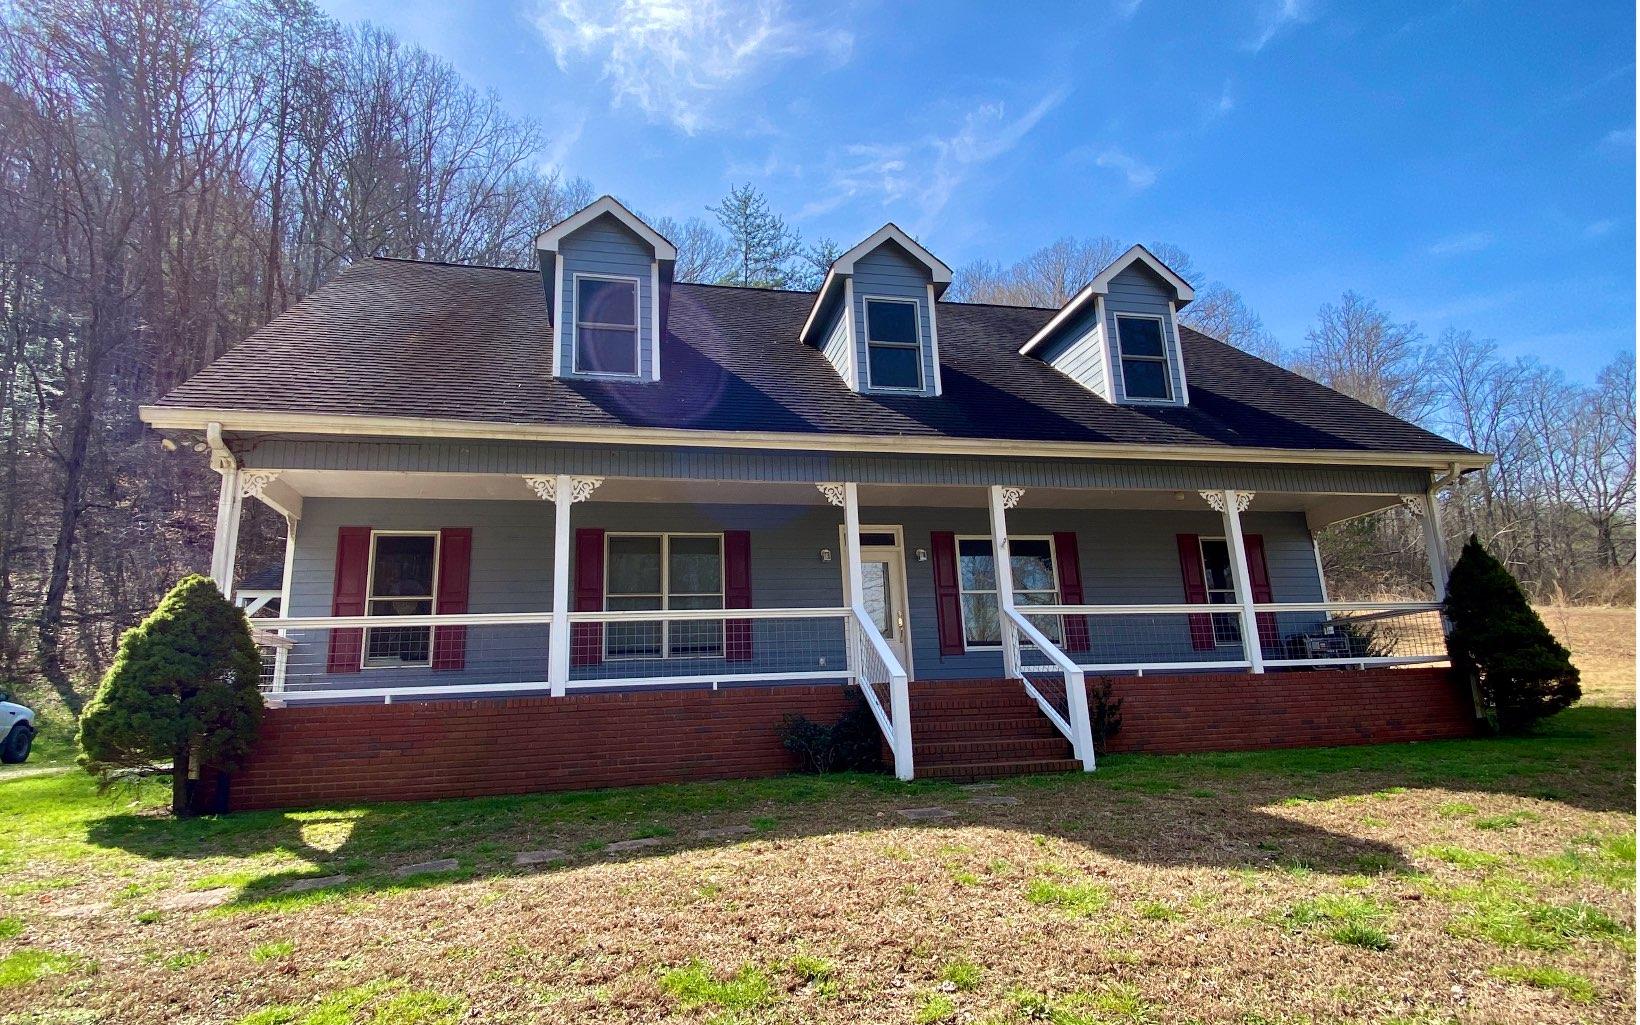 1699 BATES ROAD, Ellijay, Georgia 30540, 3 Bedrooms Bedrooms, ,3 BathroomsBathrooms,Single Family,For Sale,1699 BATES ROAD,304934